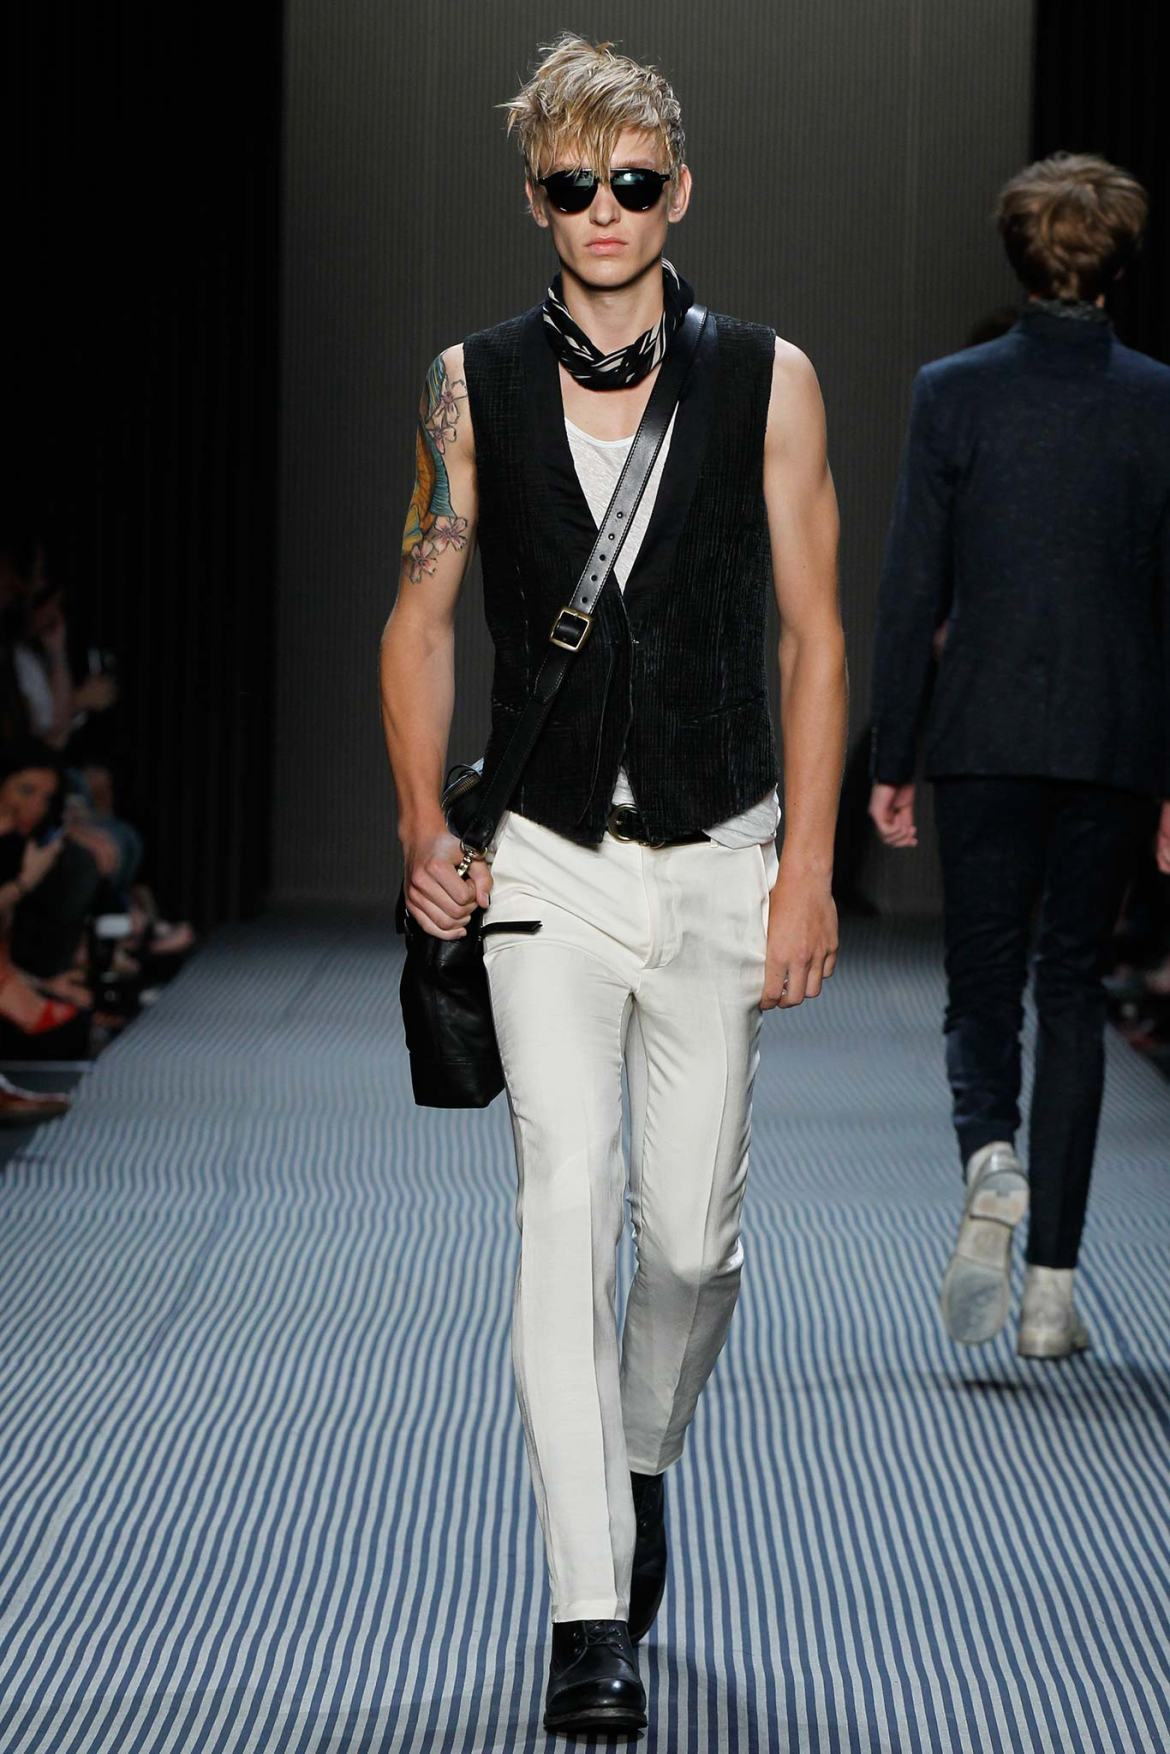 john varvatos, nyfwm, new york fashion week, new york fashion week mens, ss16